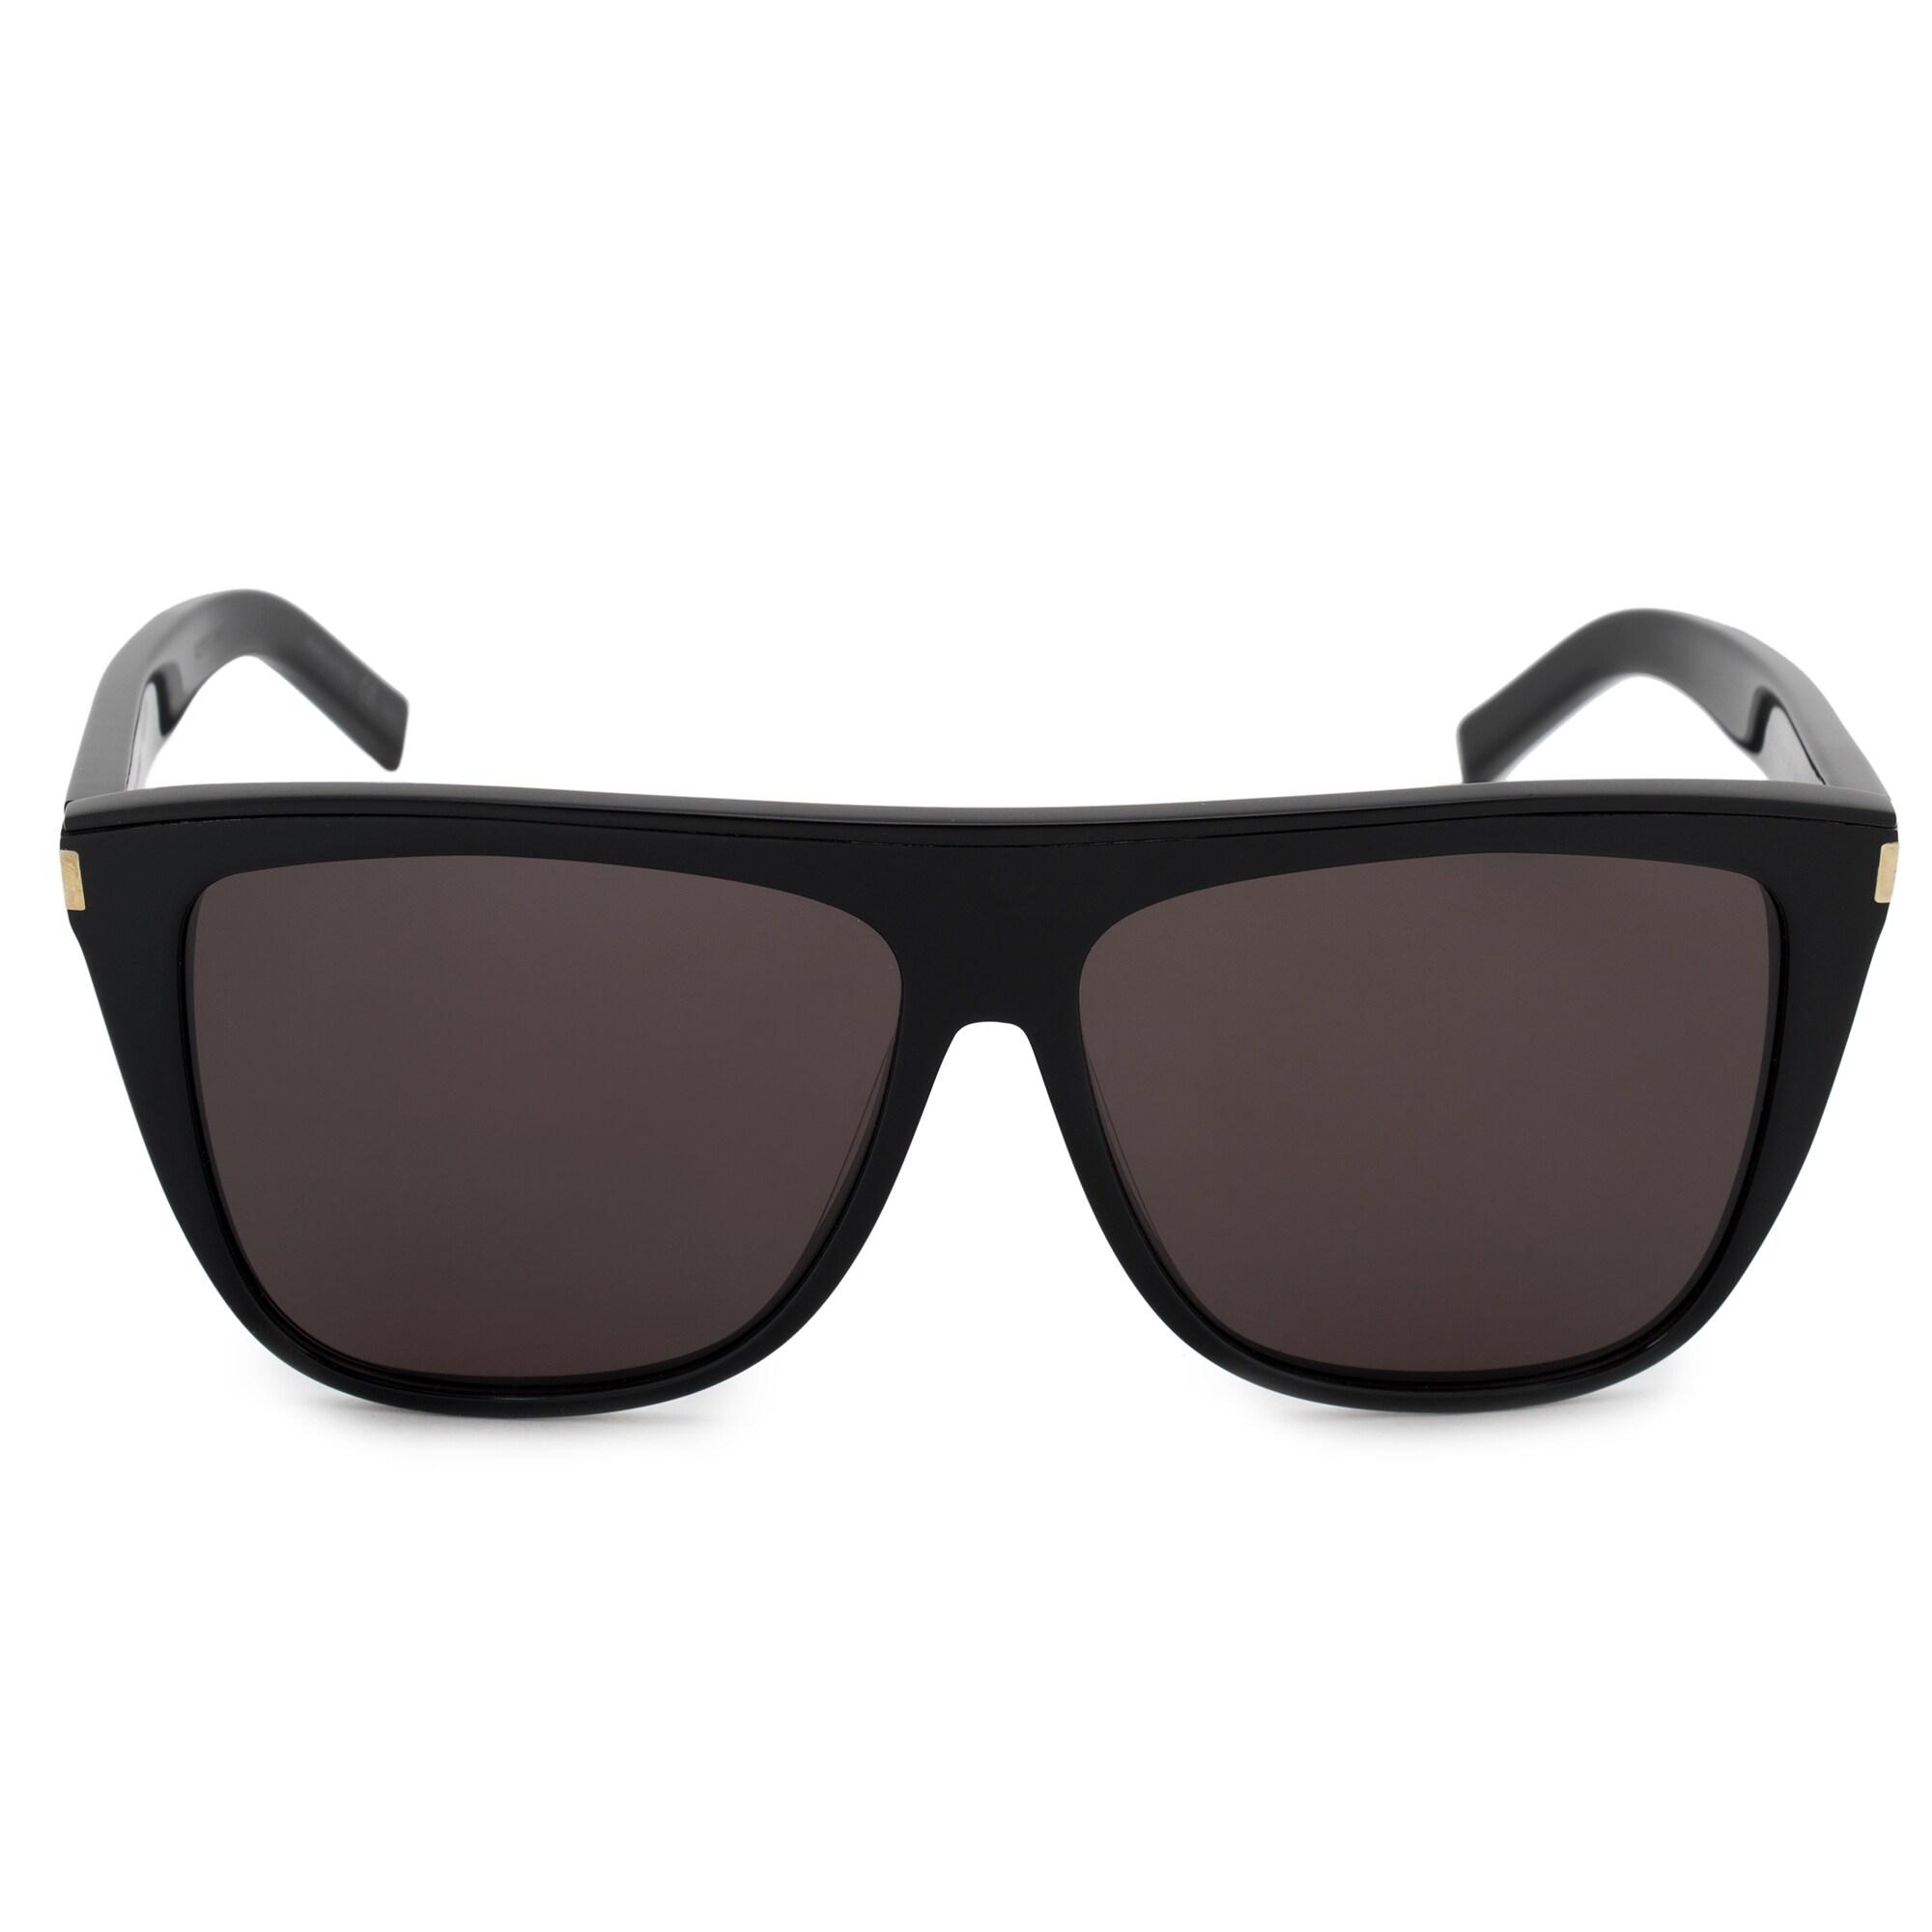 91b43c542076 Saint Laurent Women's Sunglasses   Find Great Sunglasses Deals Shopping at  Overstock